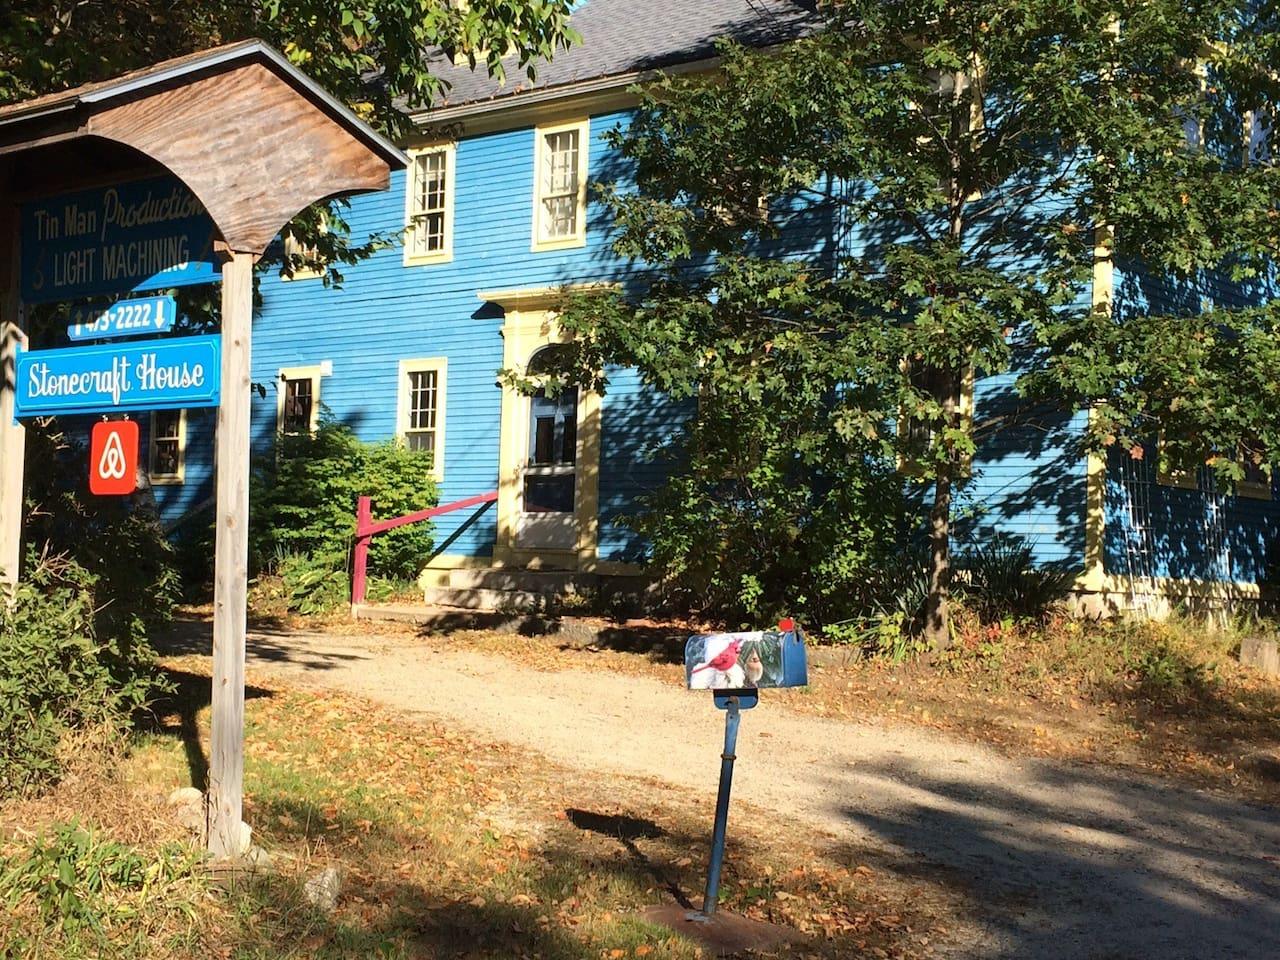 Rm 8 Stonecraft House Union,NH